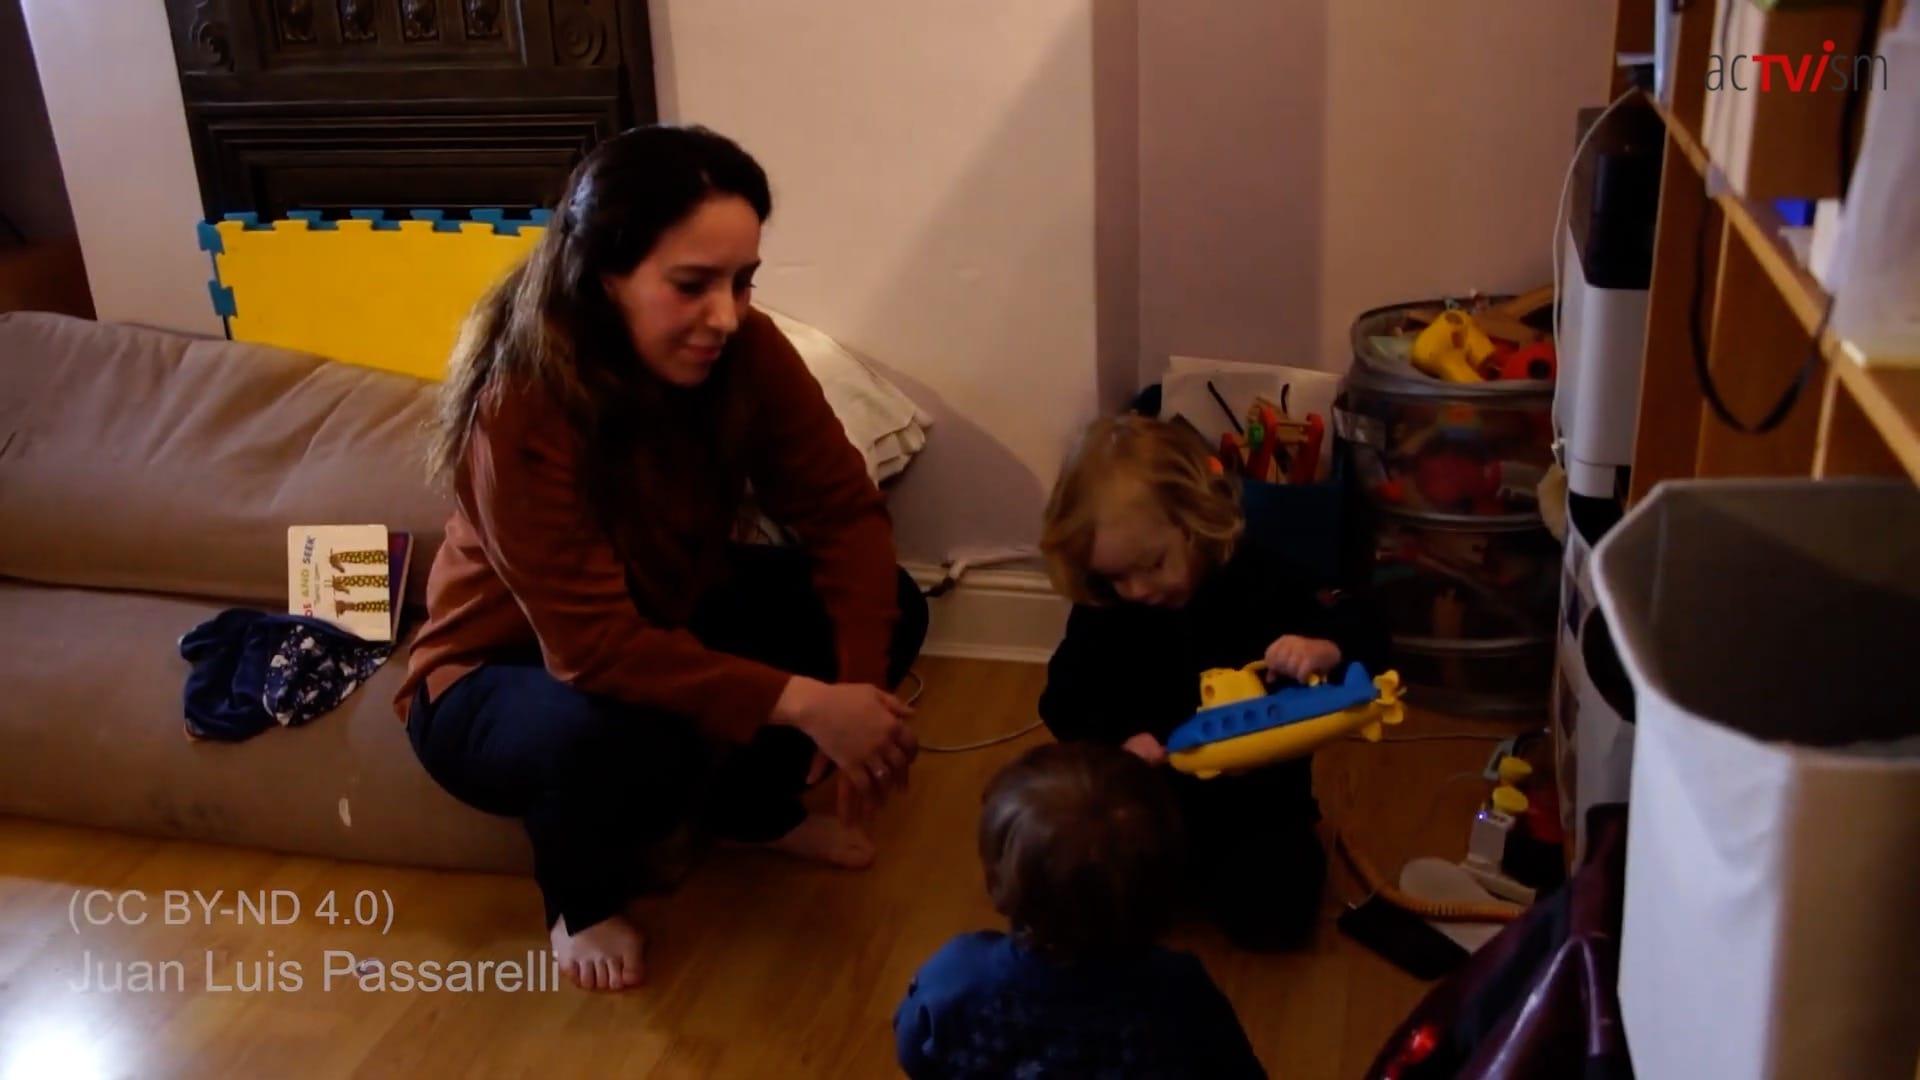 Julian Assange family financee wife children